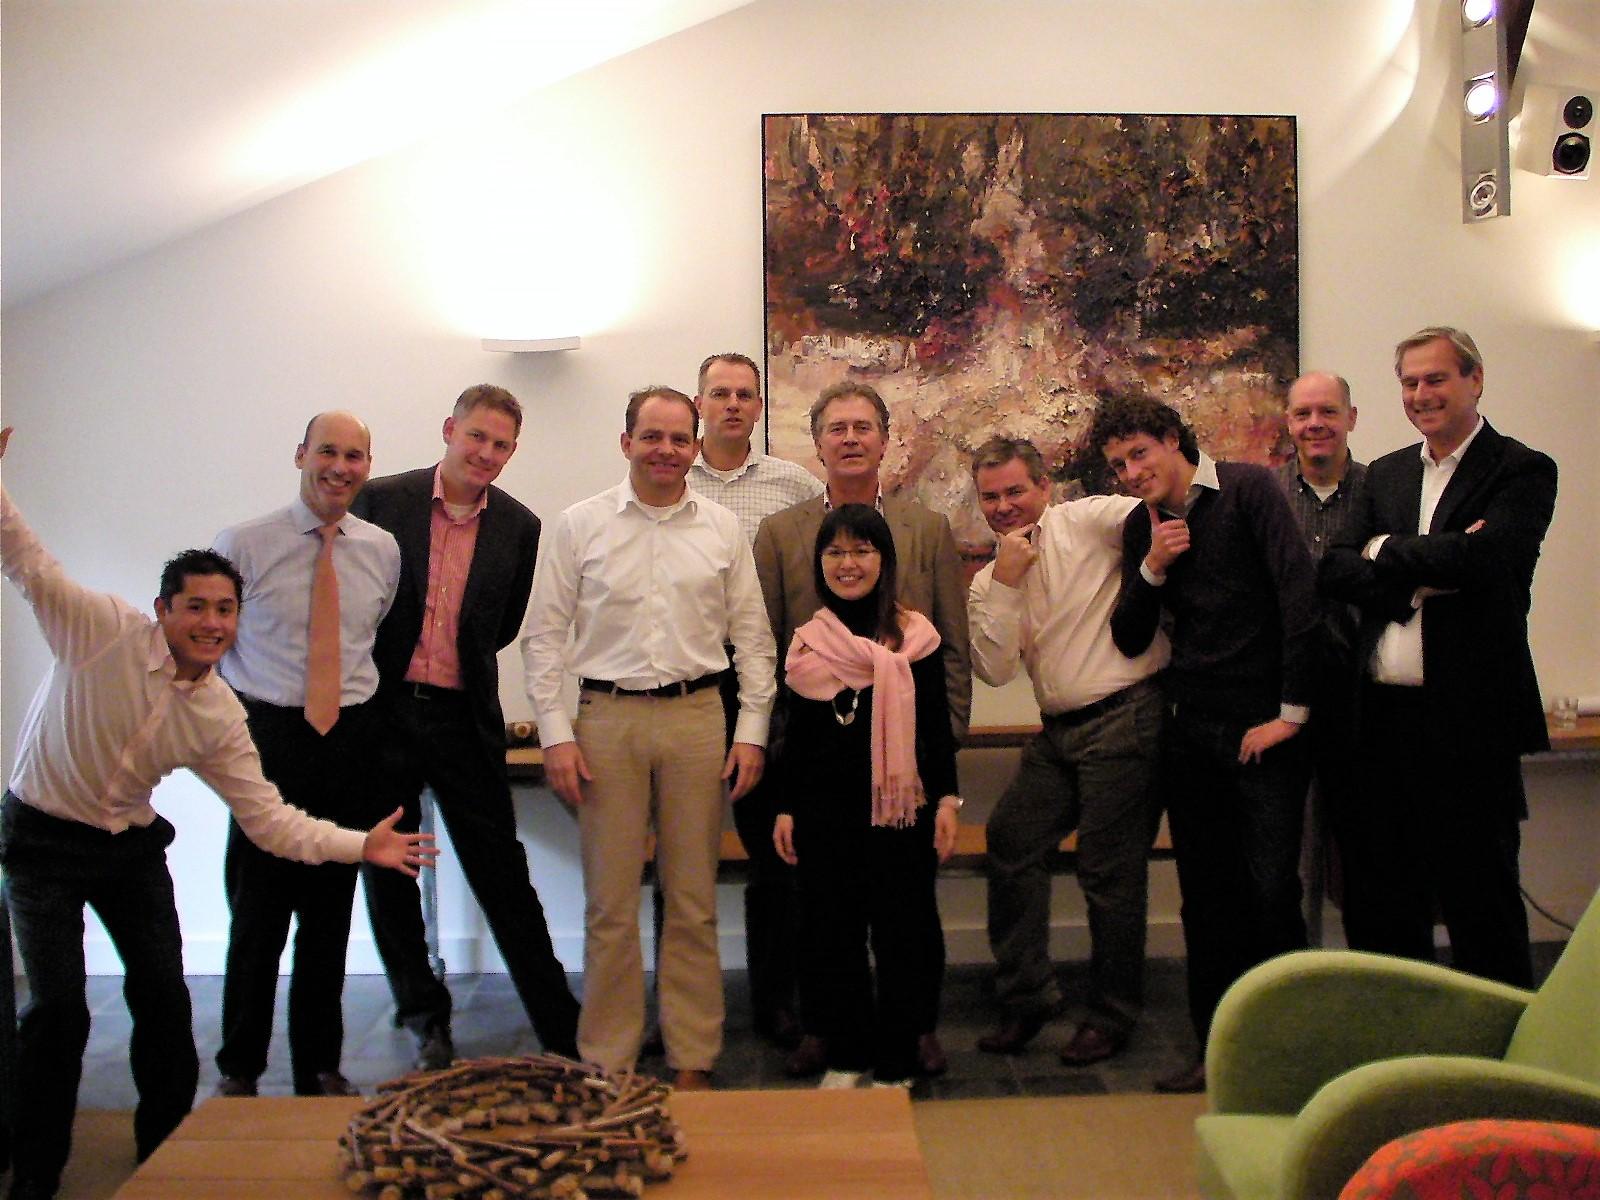 Presentation in Netherland 2009